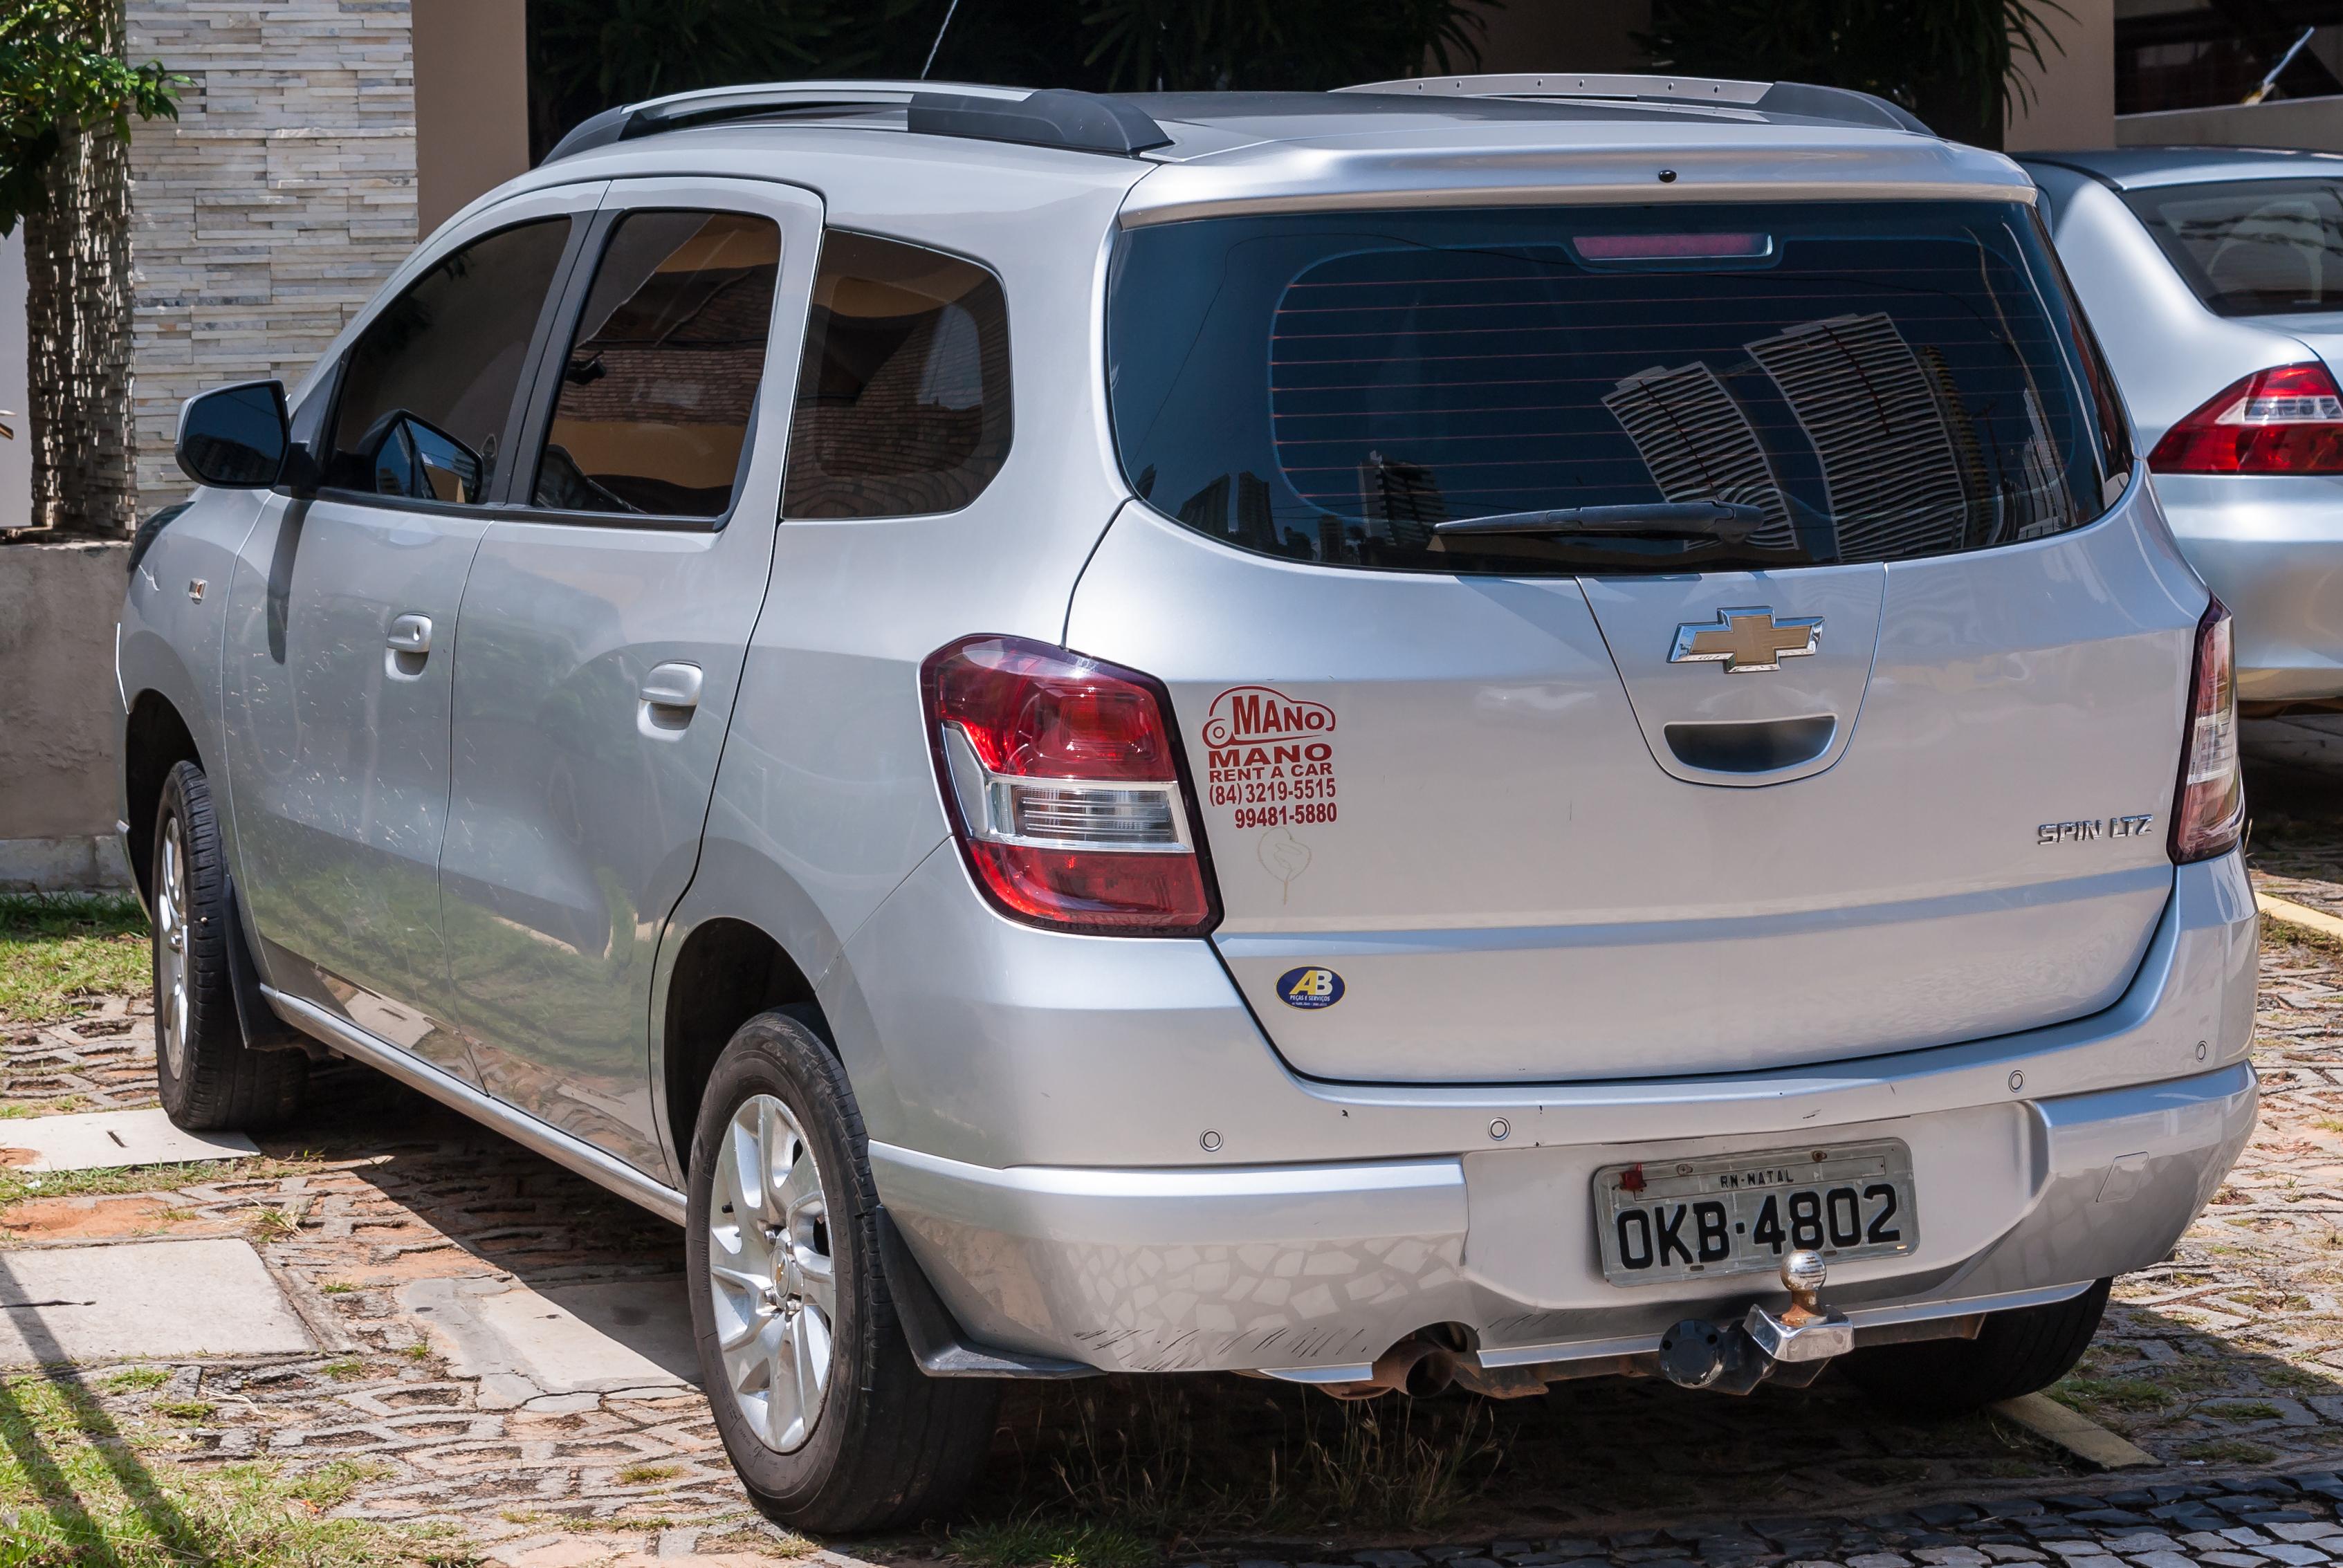 File:Chevrolet Spin 20150814-DSC05636.JPG - Wikimedia Commons on car spin, testimoni chevy spin, hummer spin, honda spin, mobil spin,